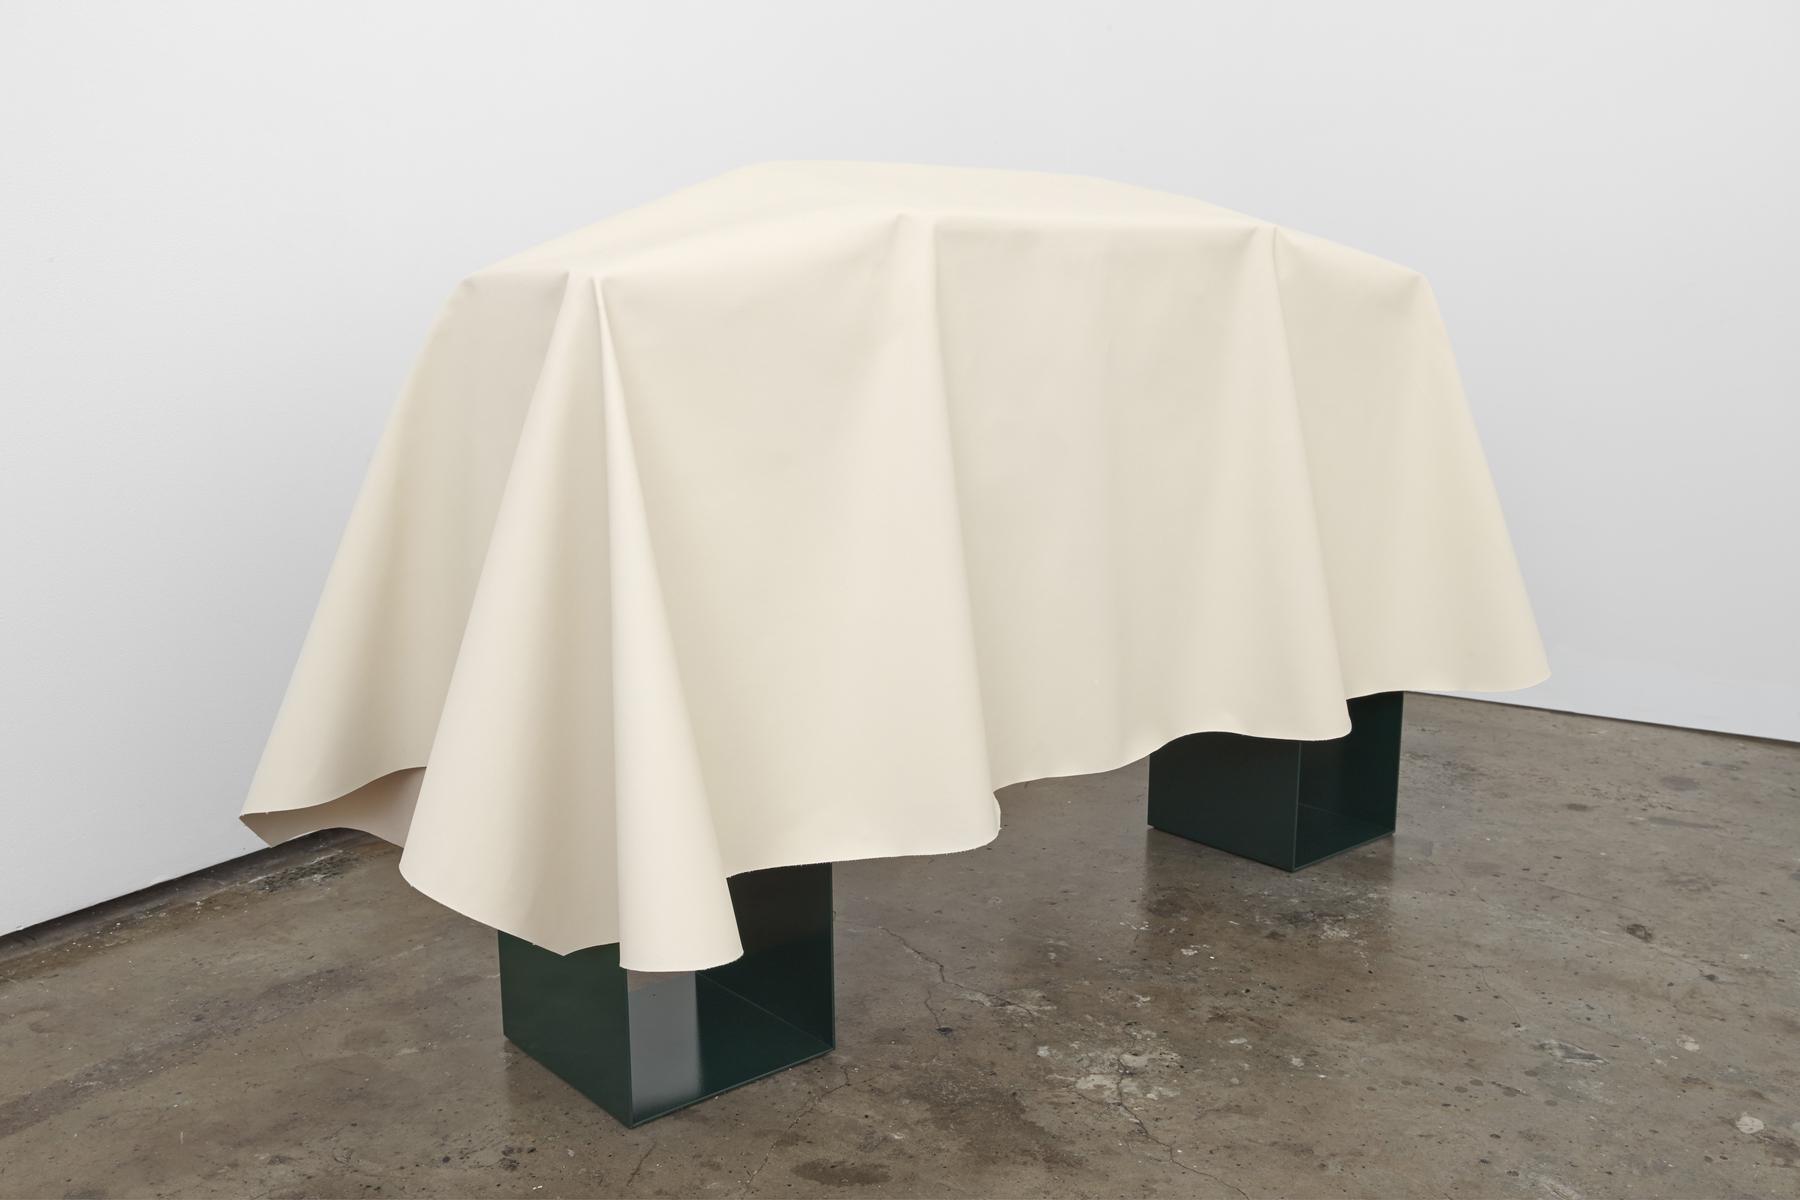 Artist Anna Kristensen Coat canvas reversible jacket monochrome painting minimalist sculpture BBQ altar funerary The Commercial